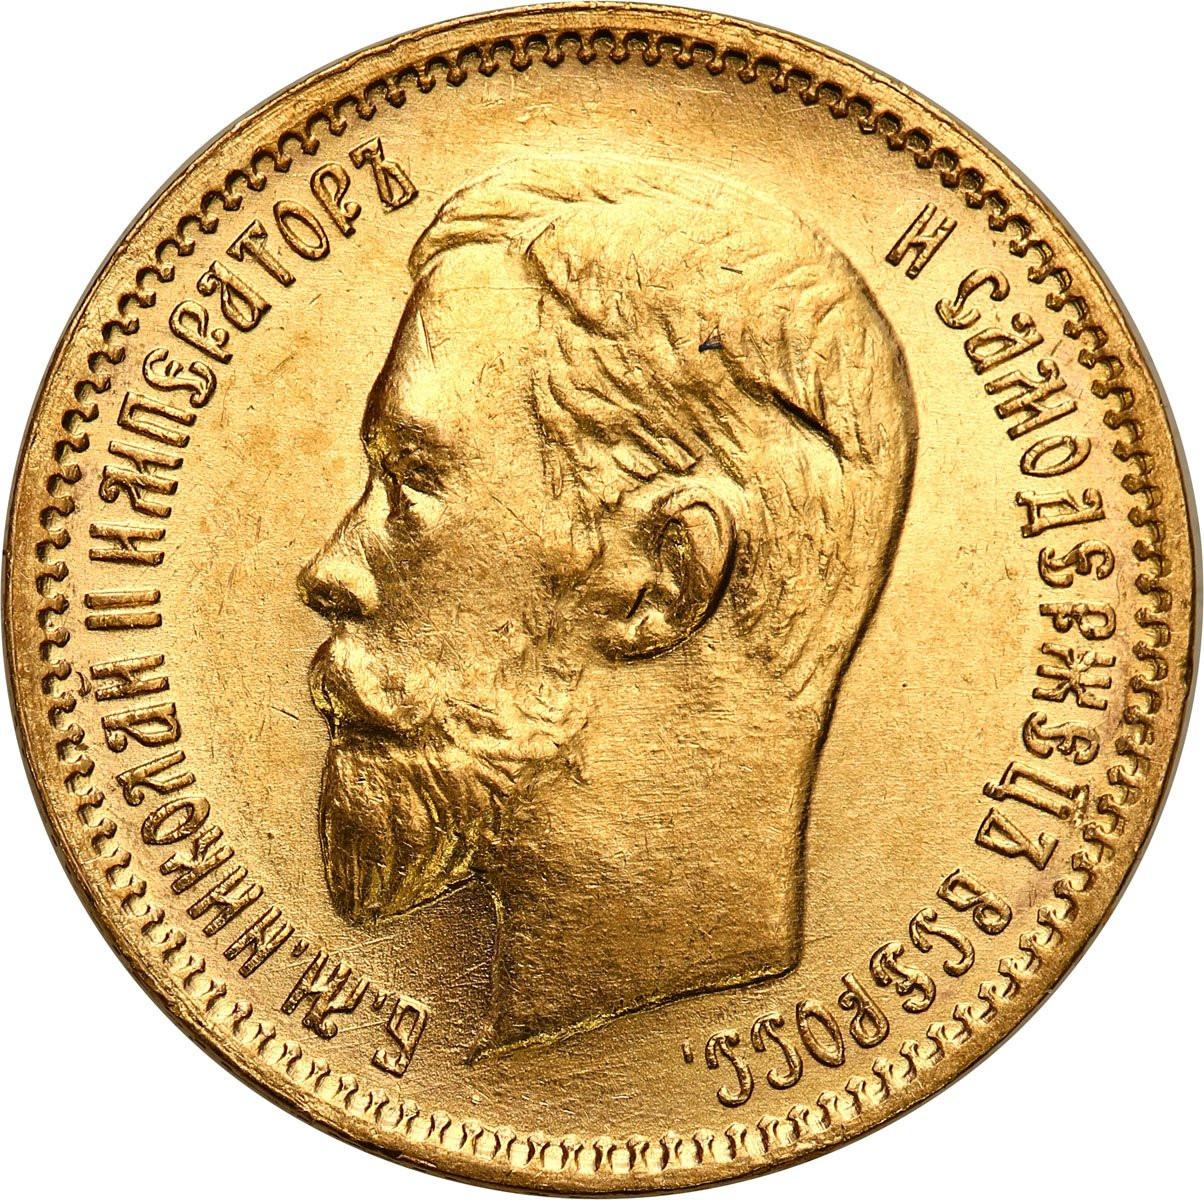 Rosja. Mikołaj II 5 rubli 1903 AP, Petersburg - PIĘKNE